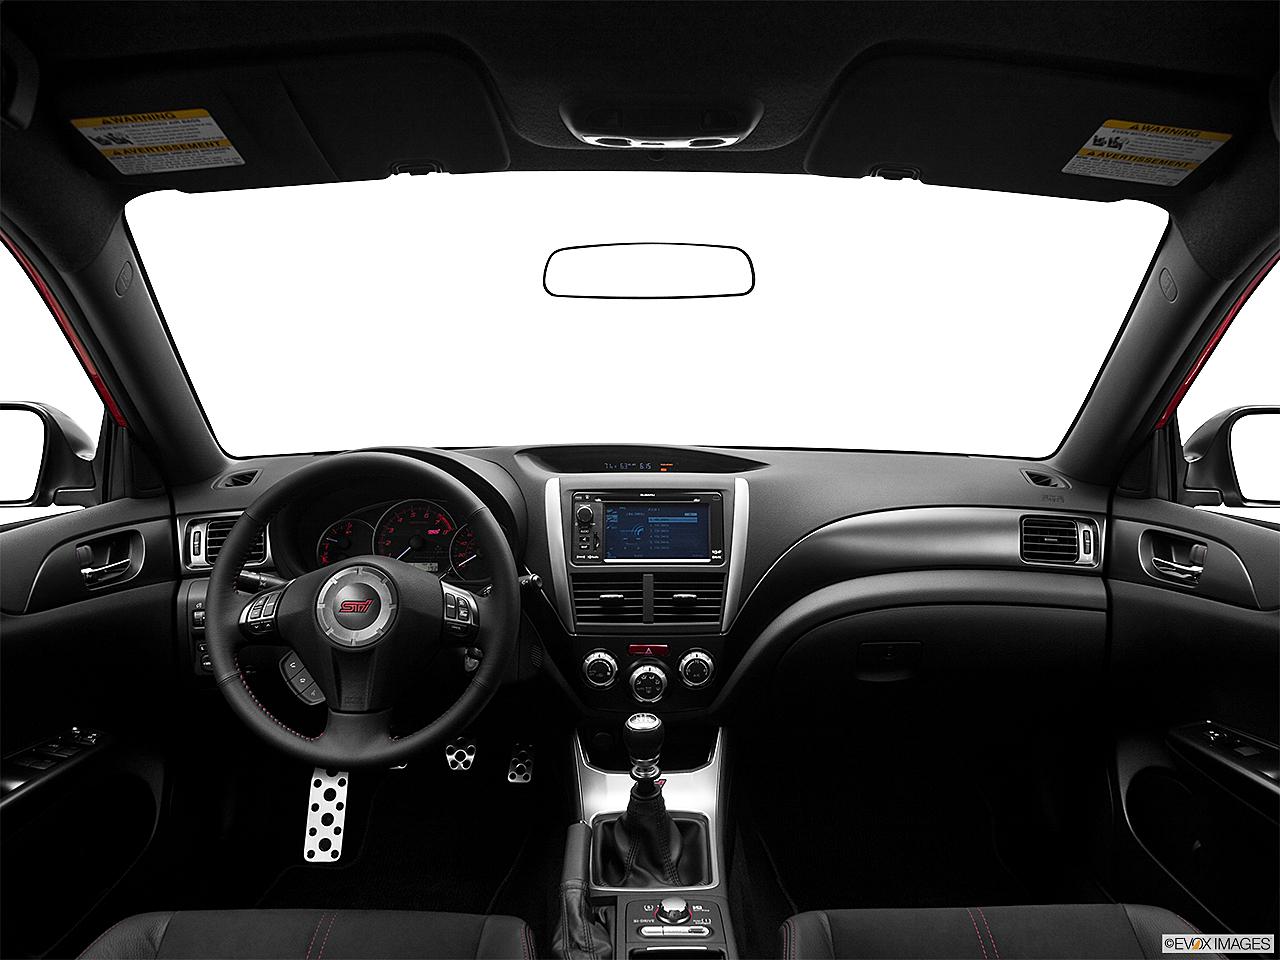 2012 Subaru Impreza AWD WRX STI 4dr Sedan - Research - GrooveCar